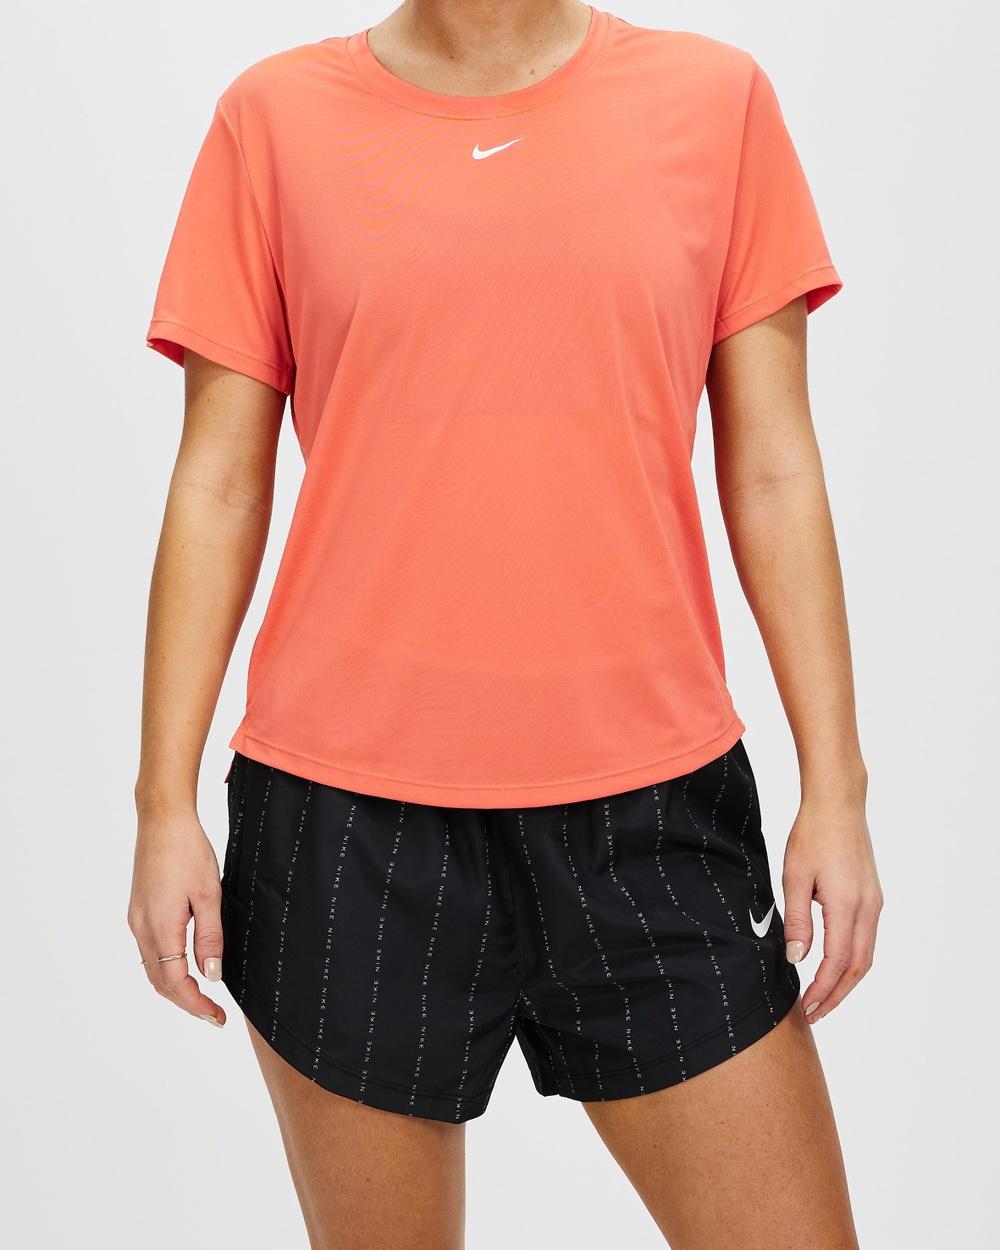 Nike One Dri FIT SS Top Short Sleeve T-Shirts Magic Ember & White Dri-FIT Australia